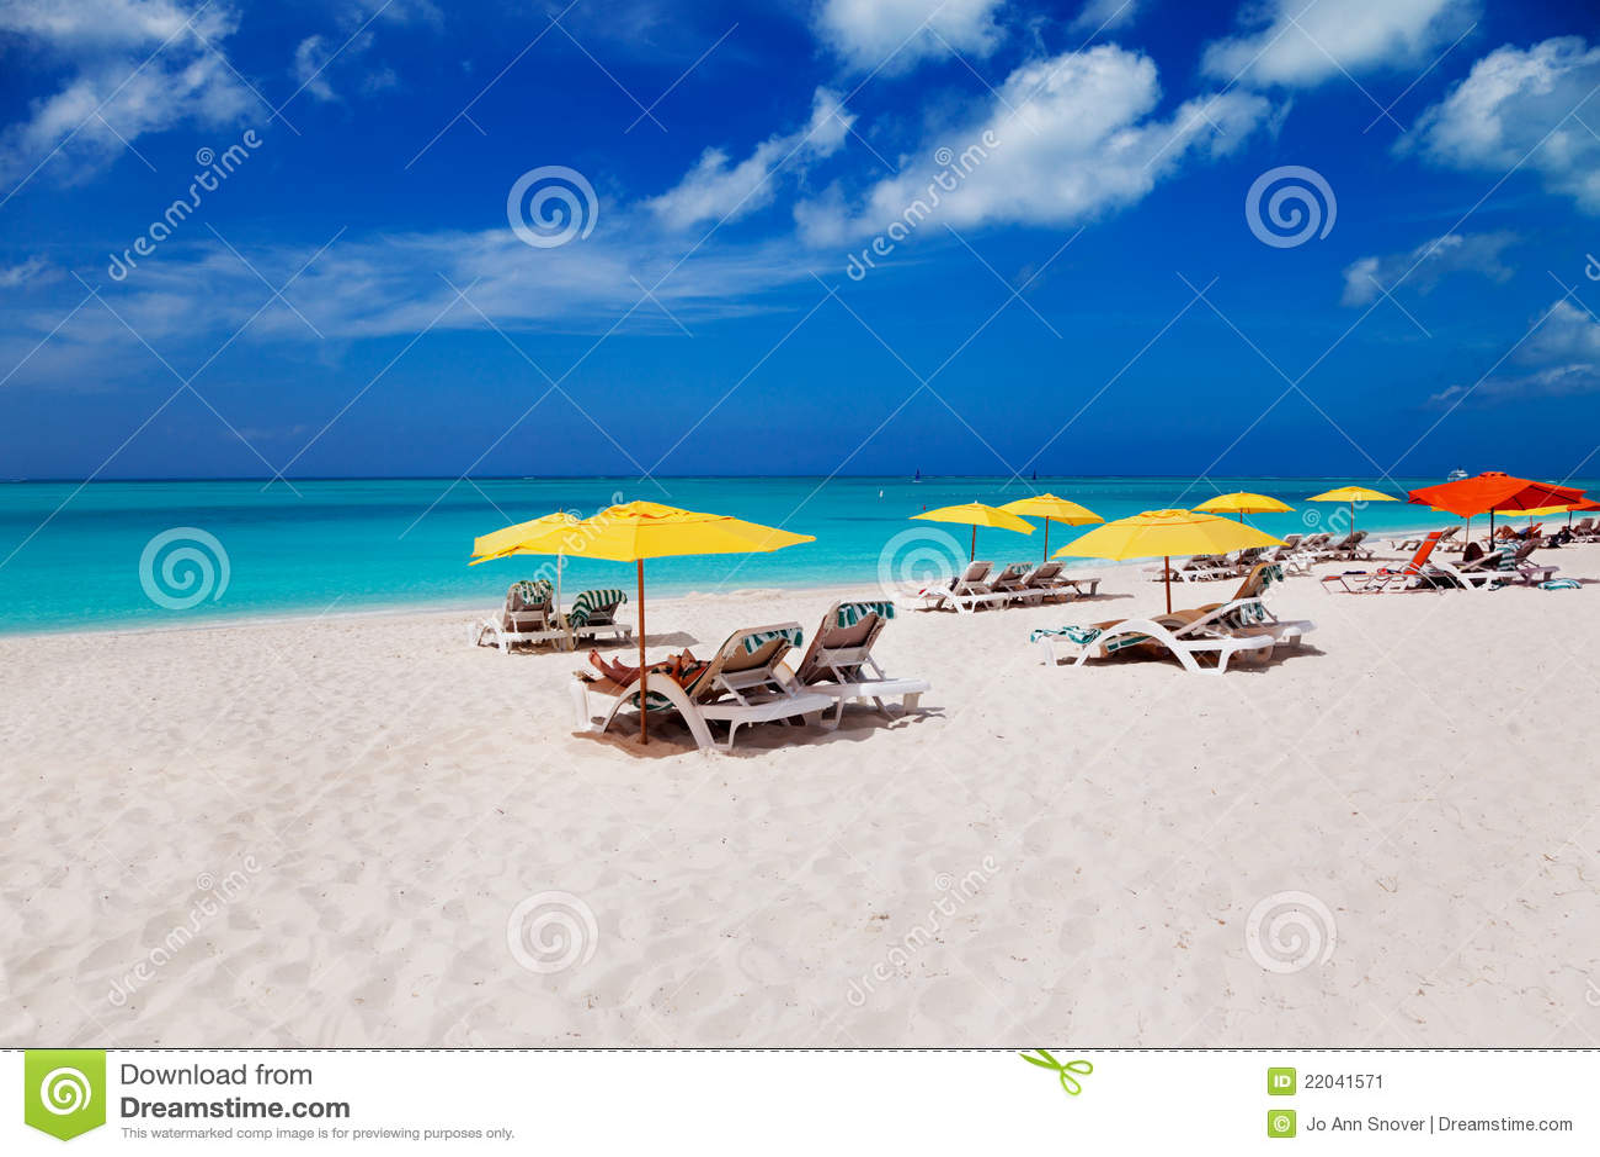 турки фиоритуры caicos пляжа залива